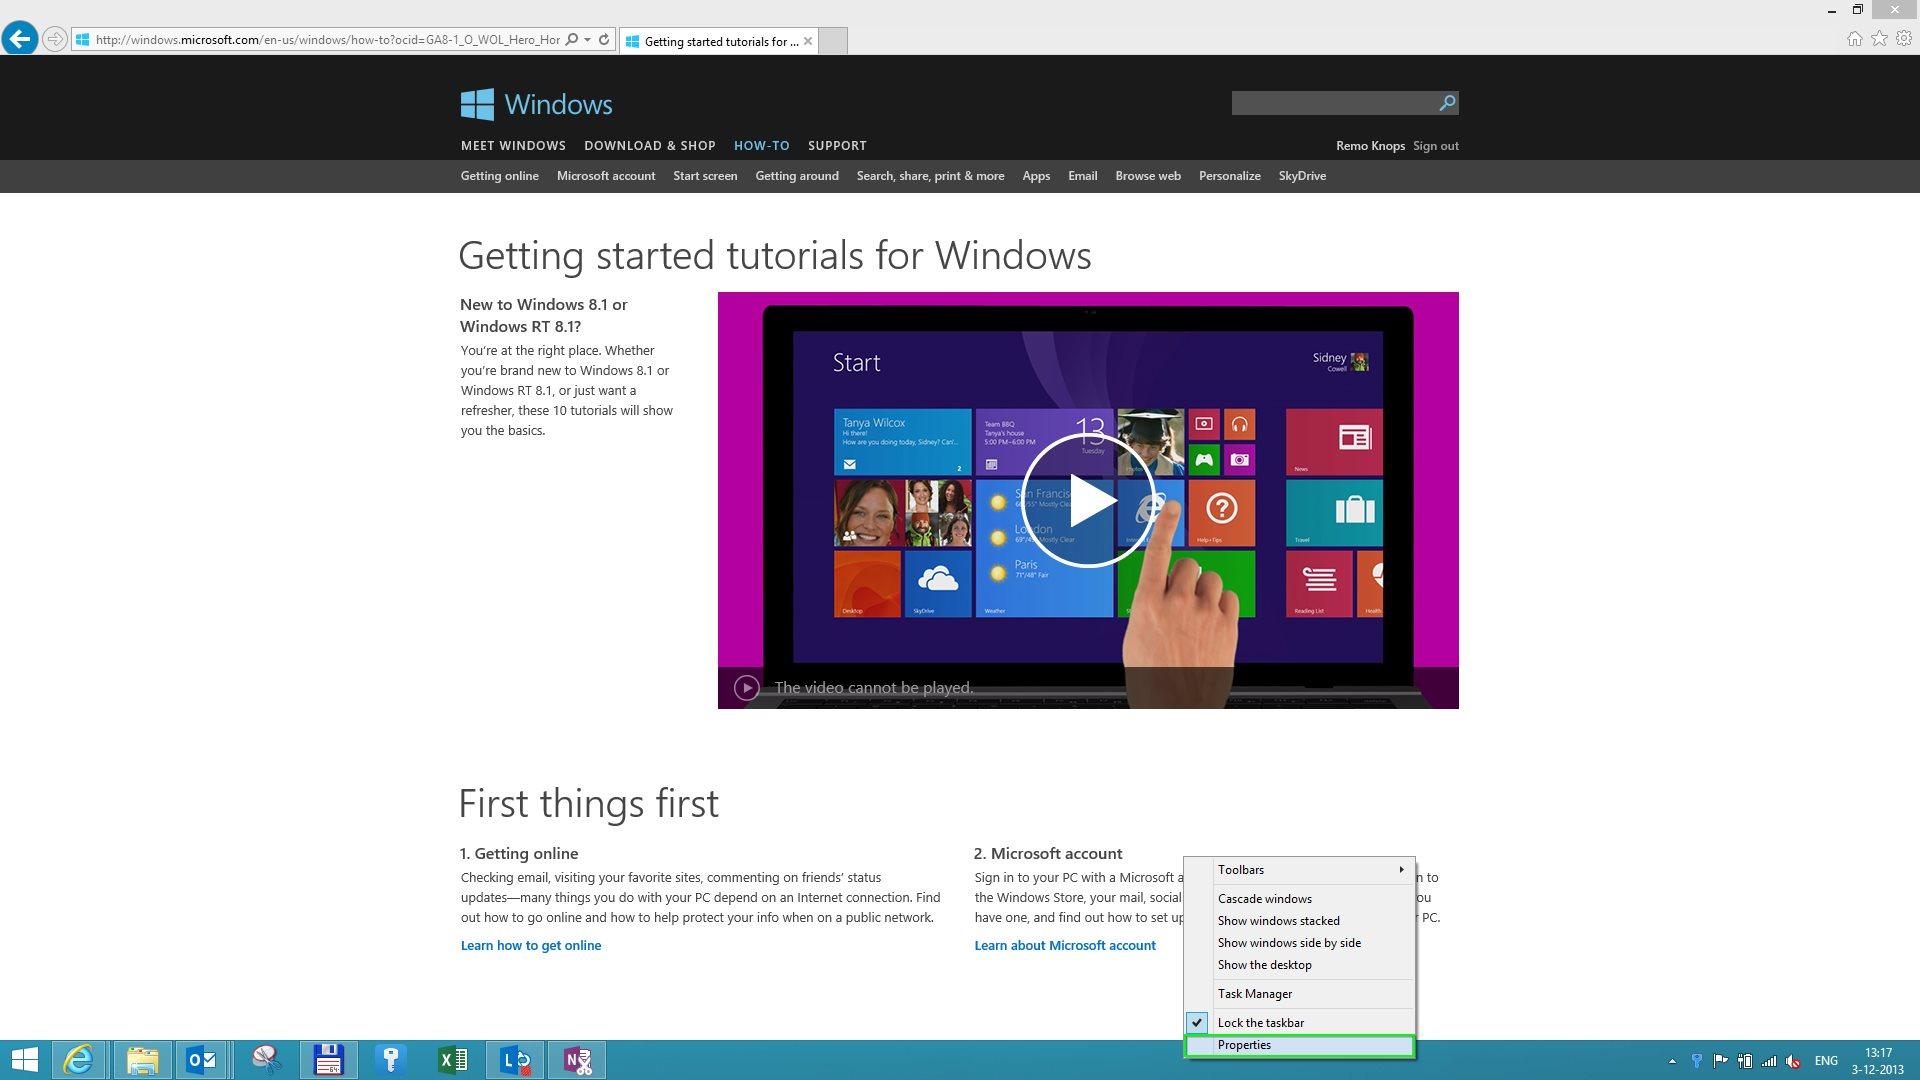 Windows 8.1 Taksbar Properties